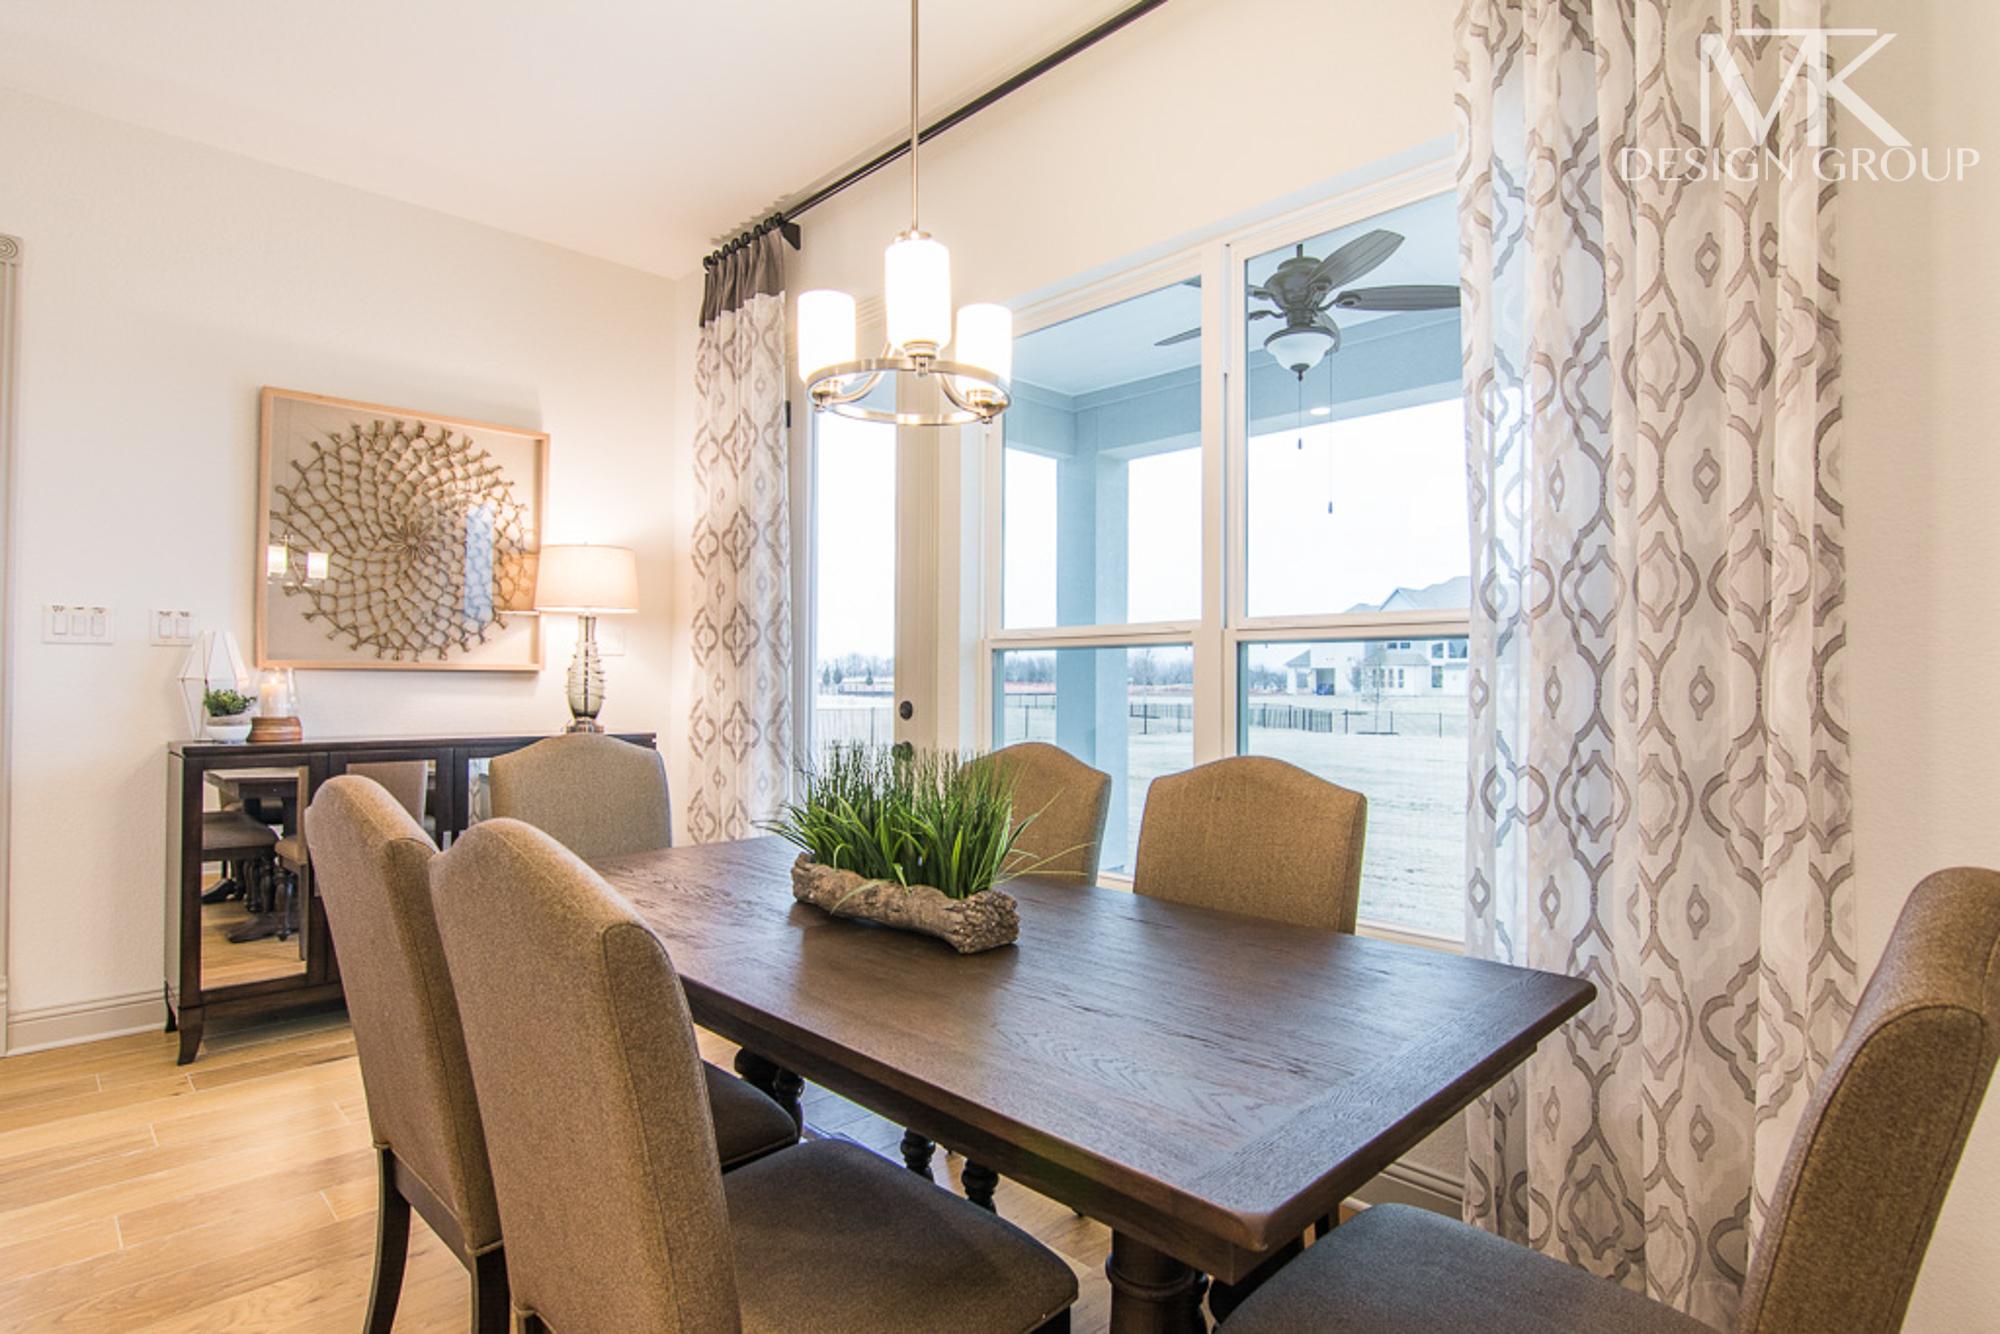 Mckinney Modern Rustic Living Room Design, MTK Design Group, DFW Interior Decorator (19 of 33)